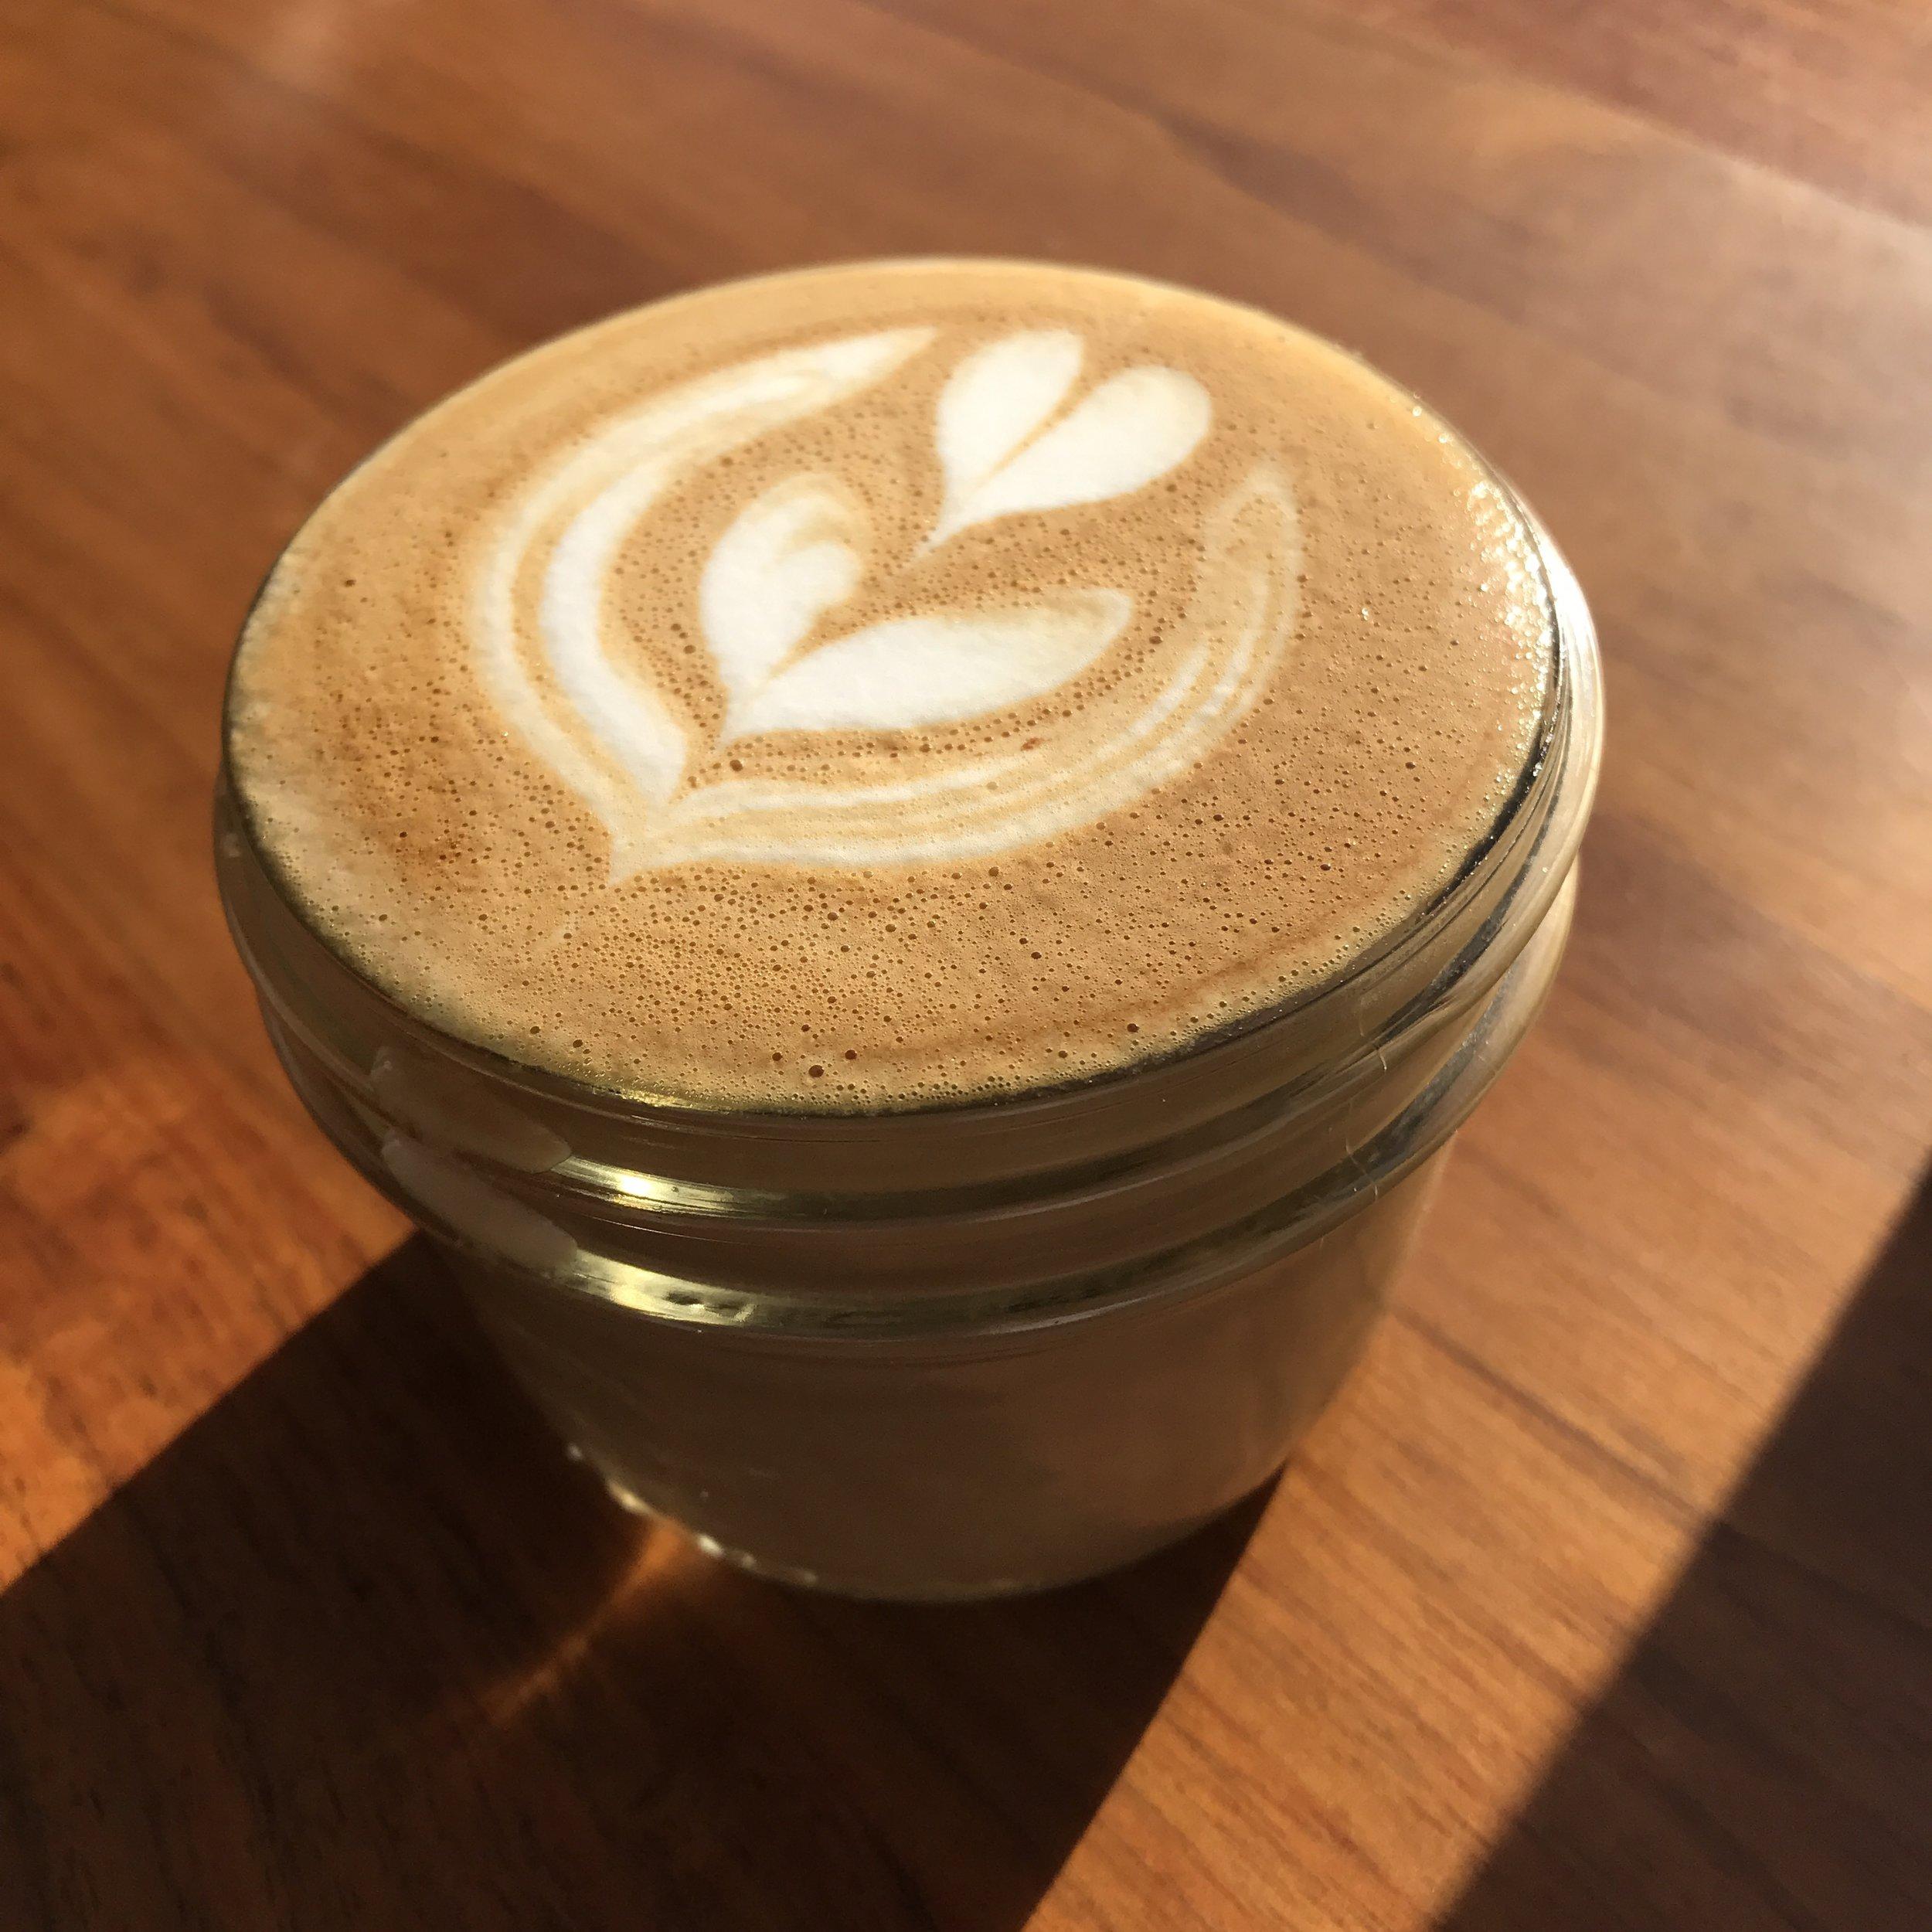 WARM COFFEE IN WINTER SUNSHINE